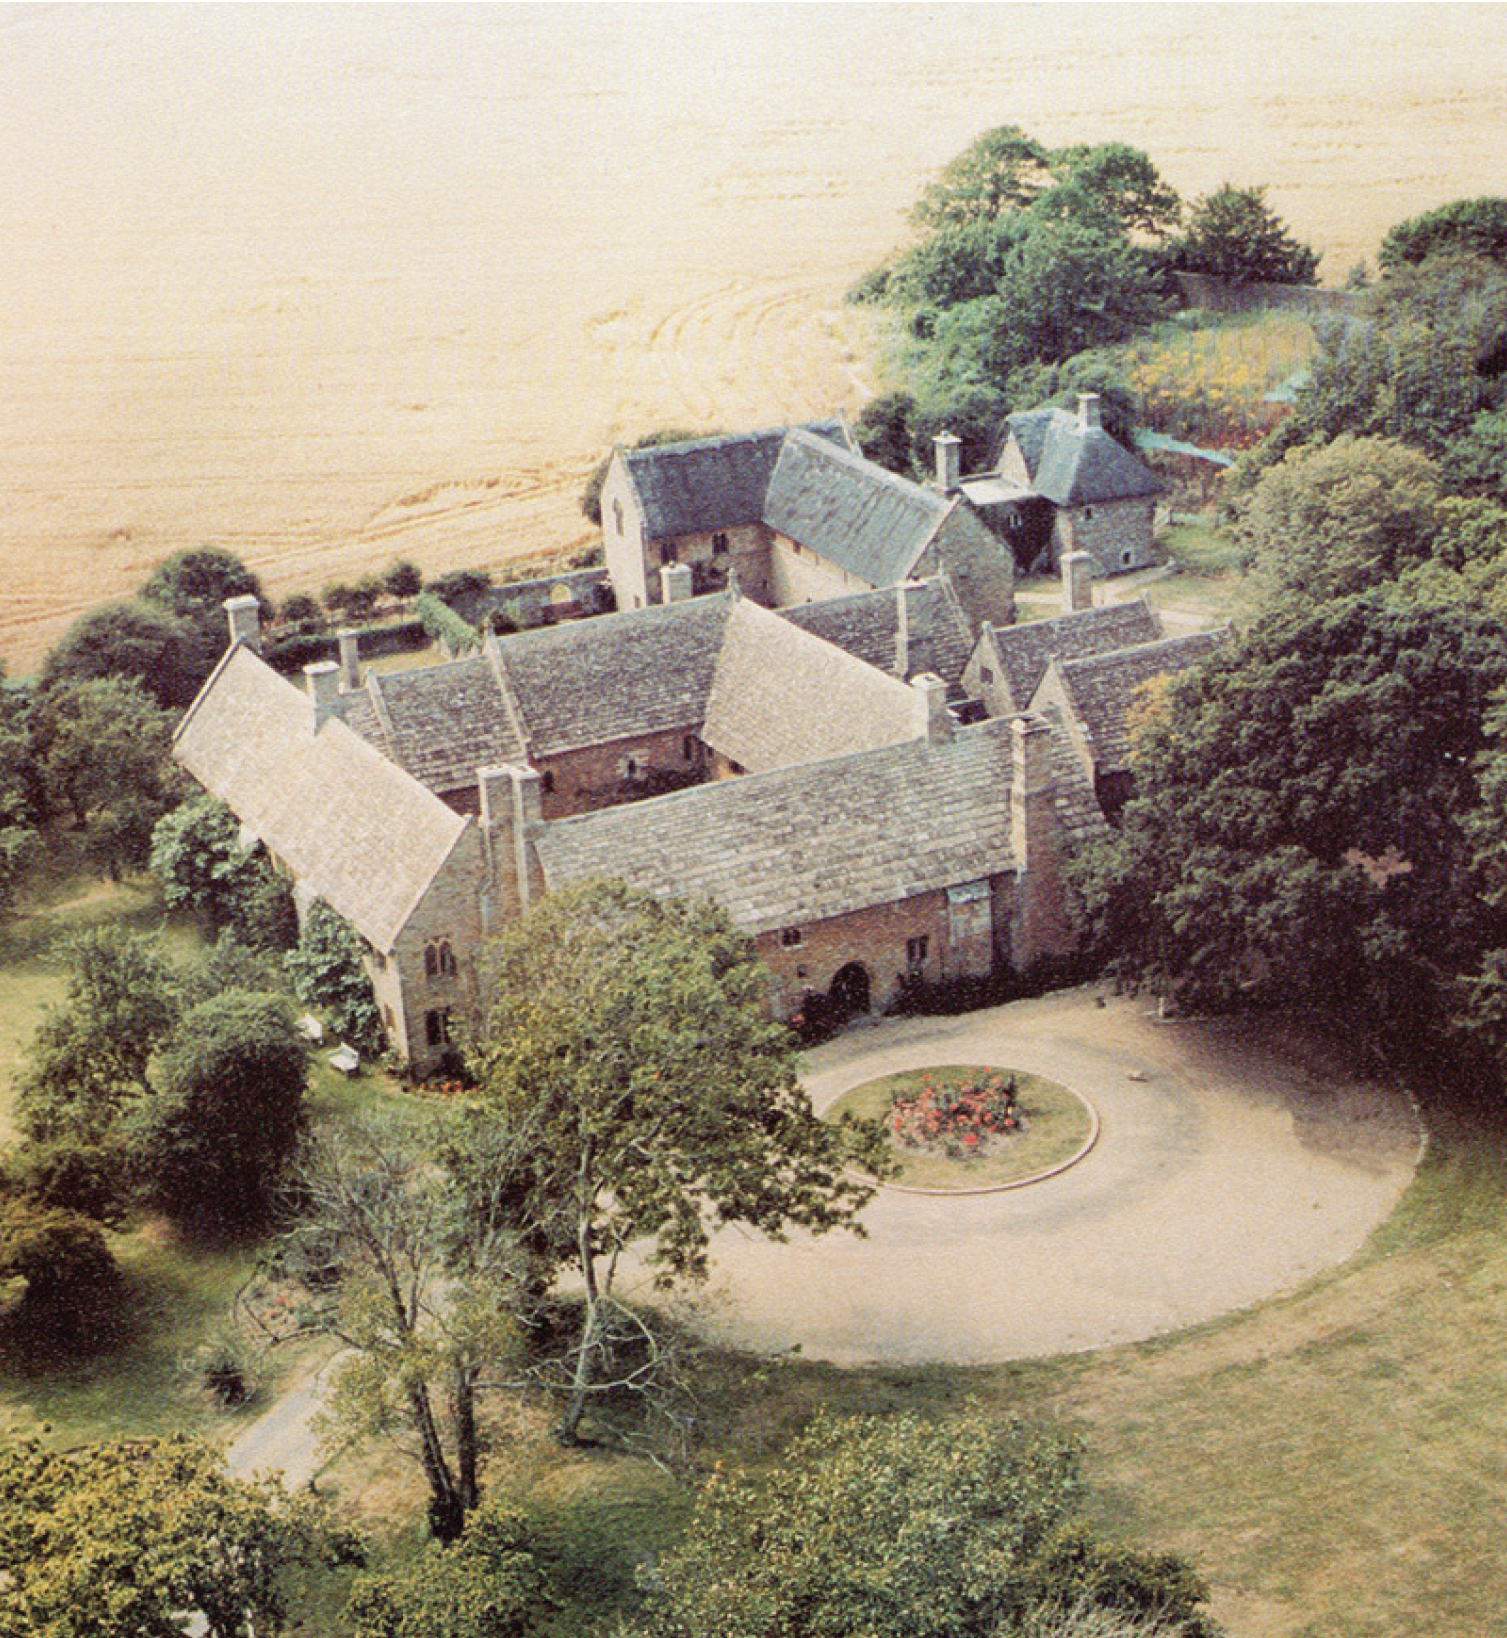 Aerial view of Bailiffscourt